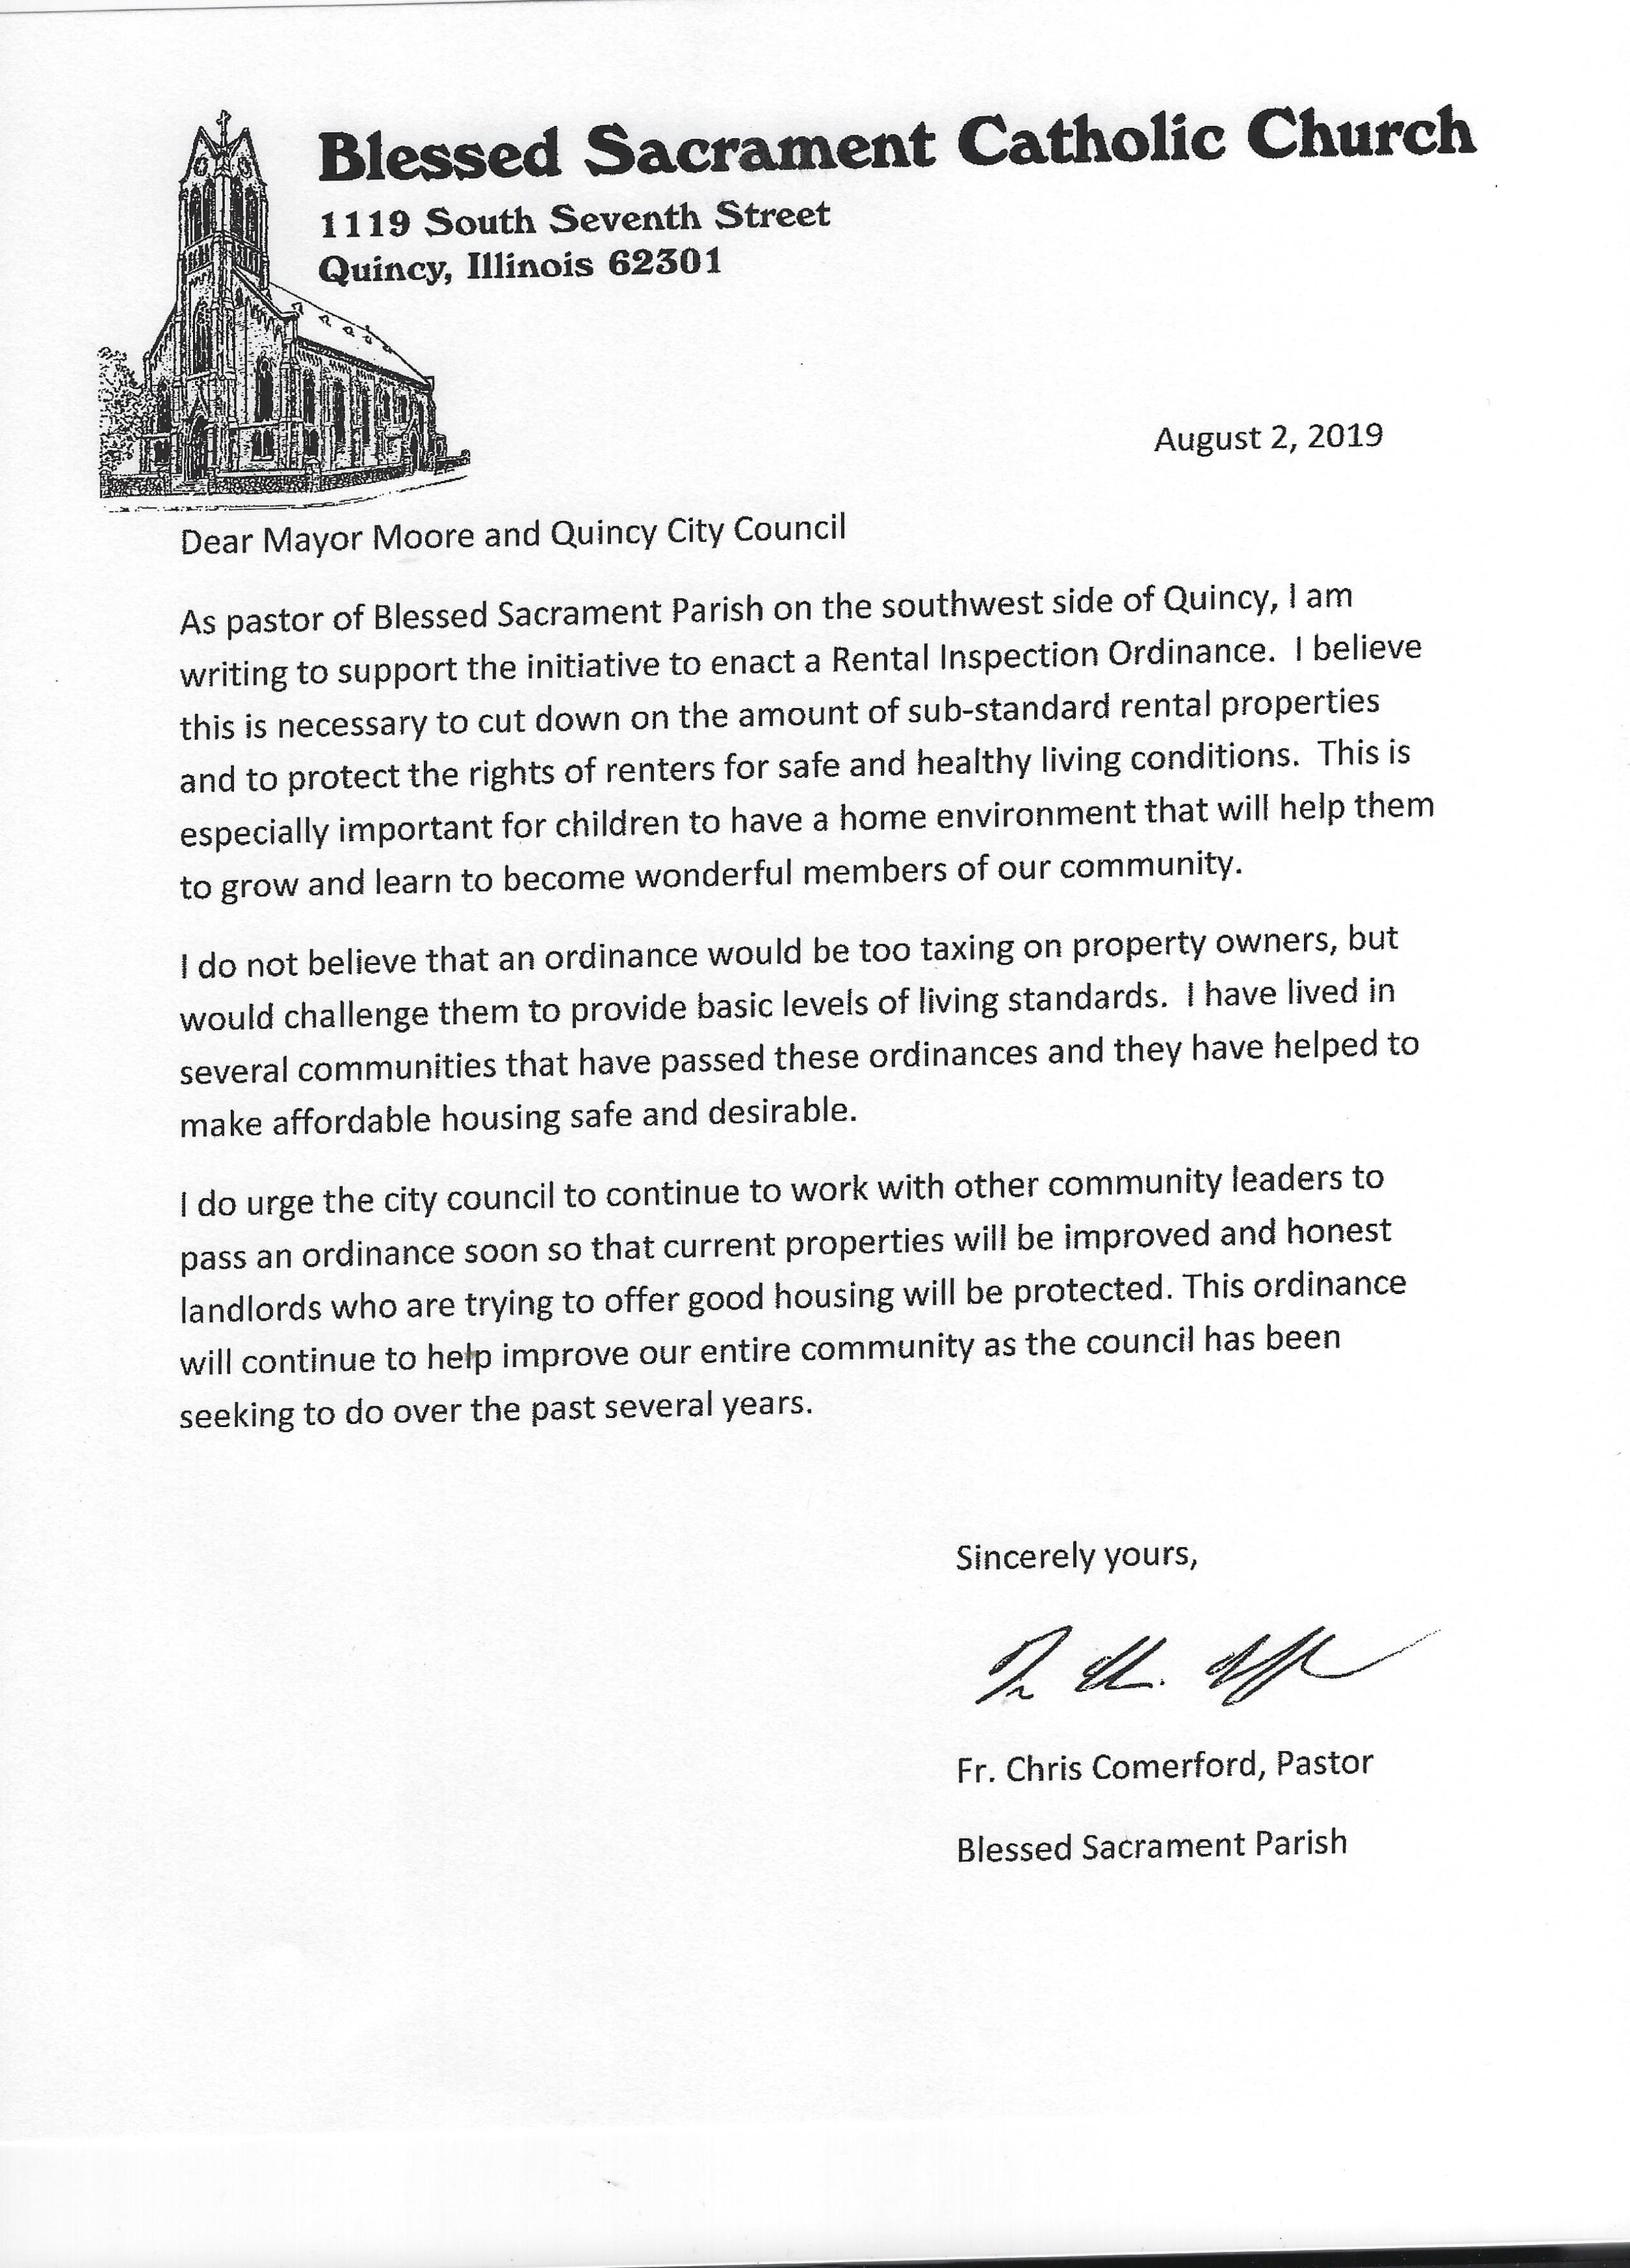 QIPP Blessed Sacrament Church Letter of Support.jpeg